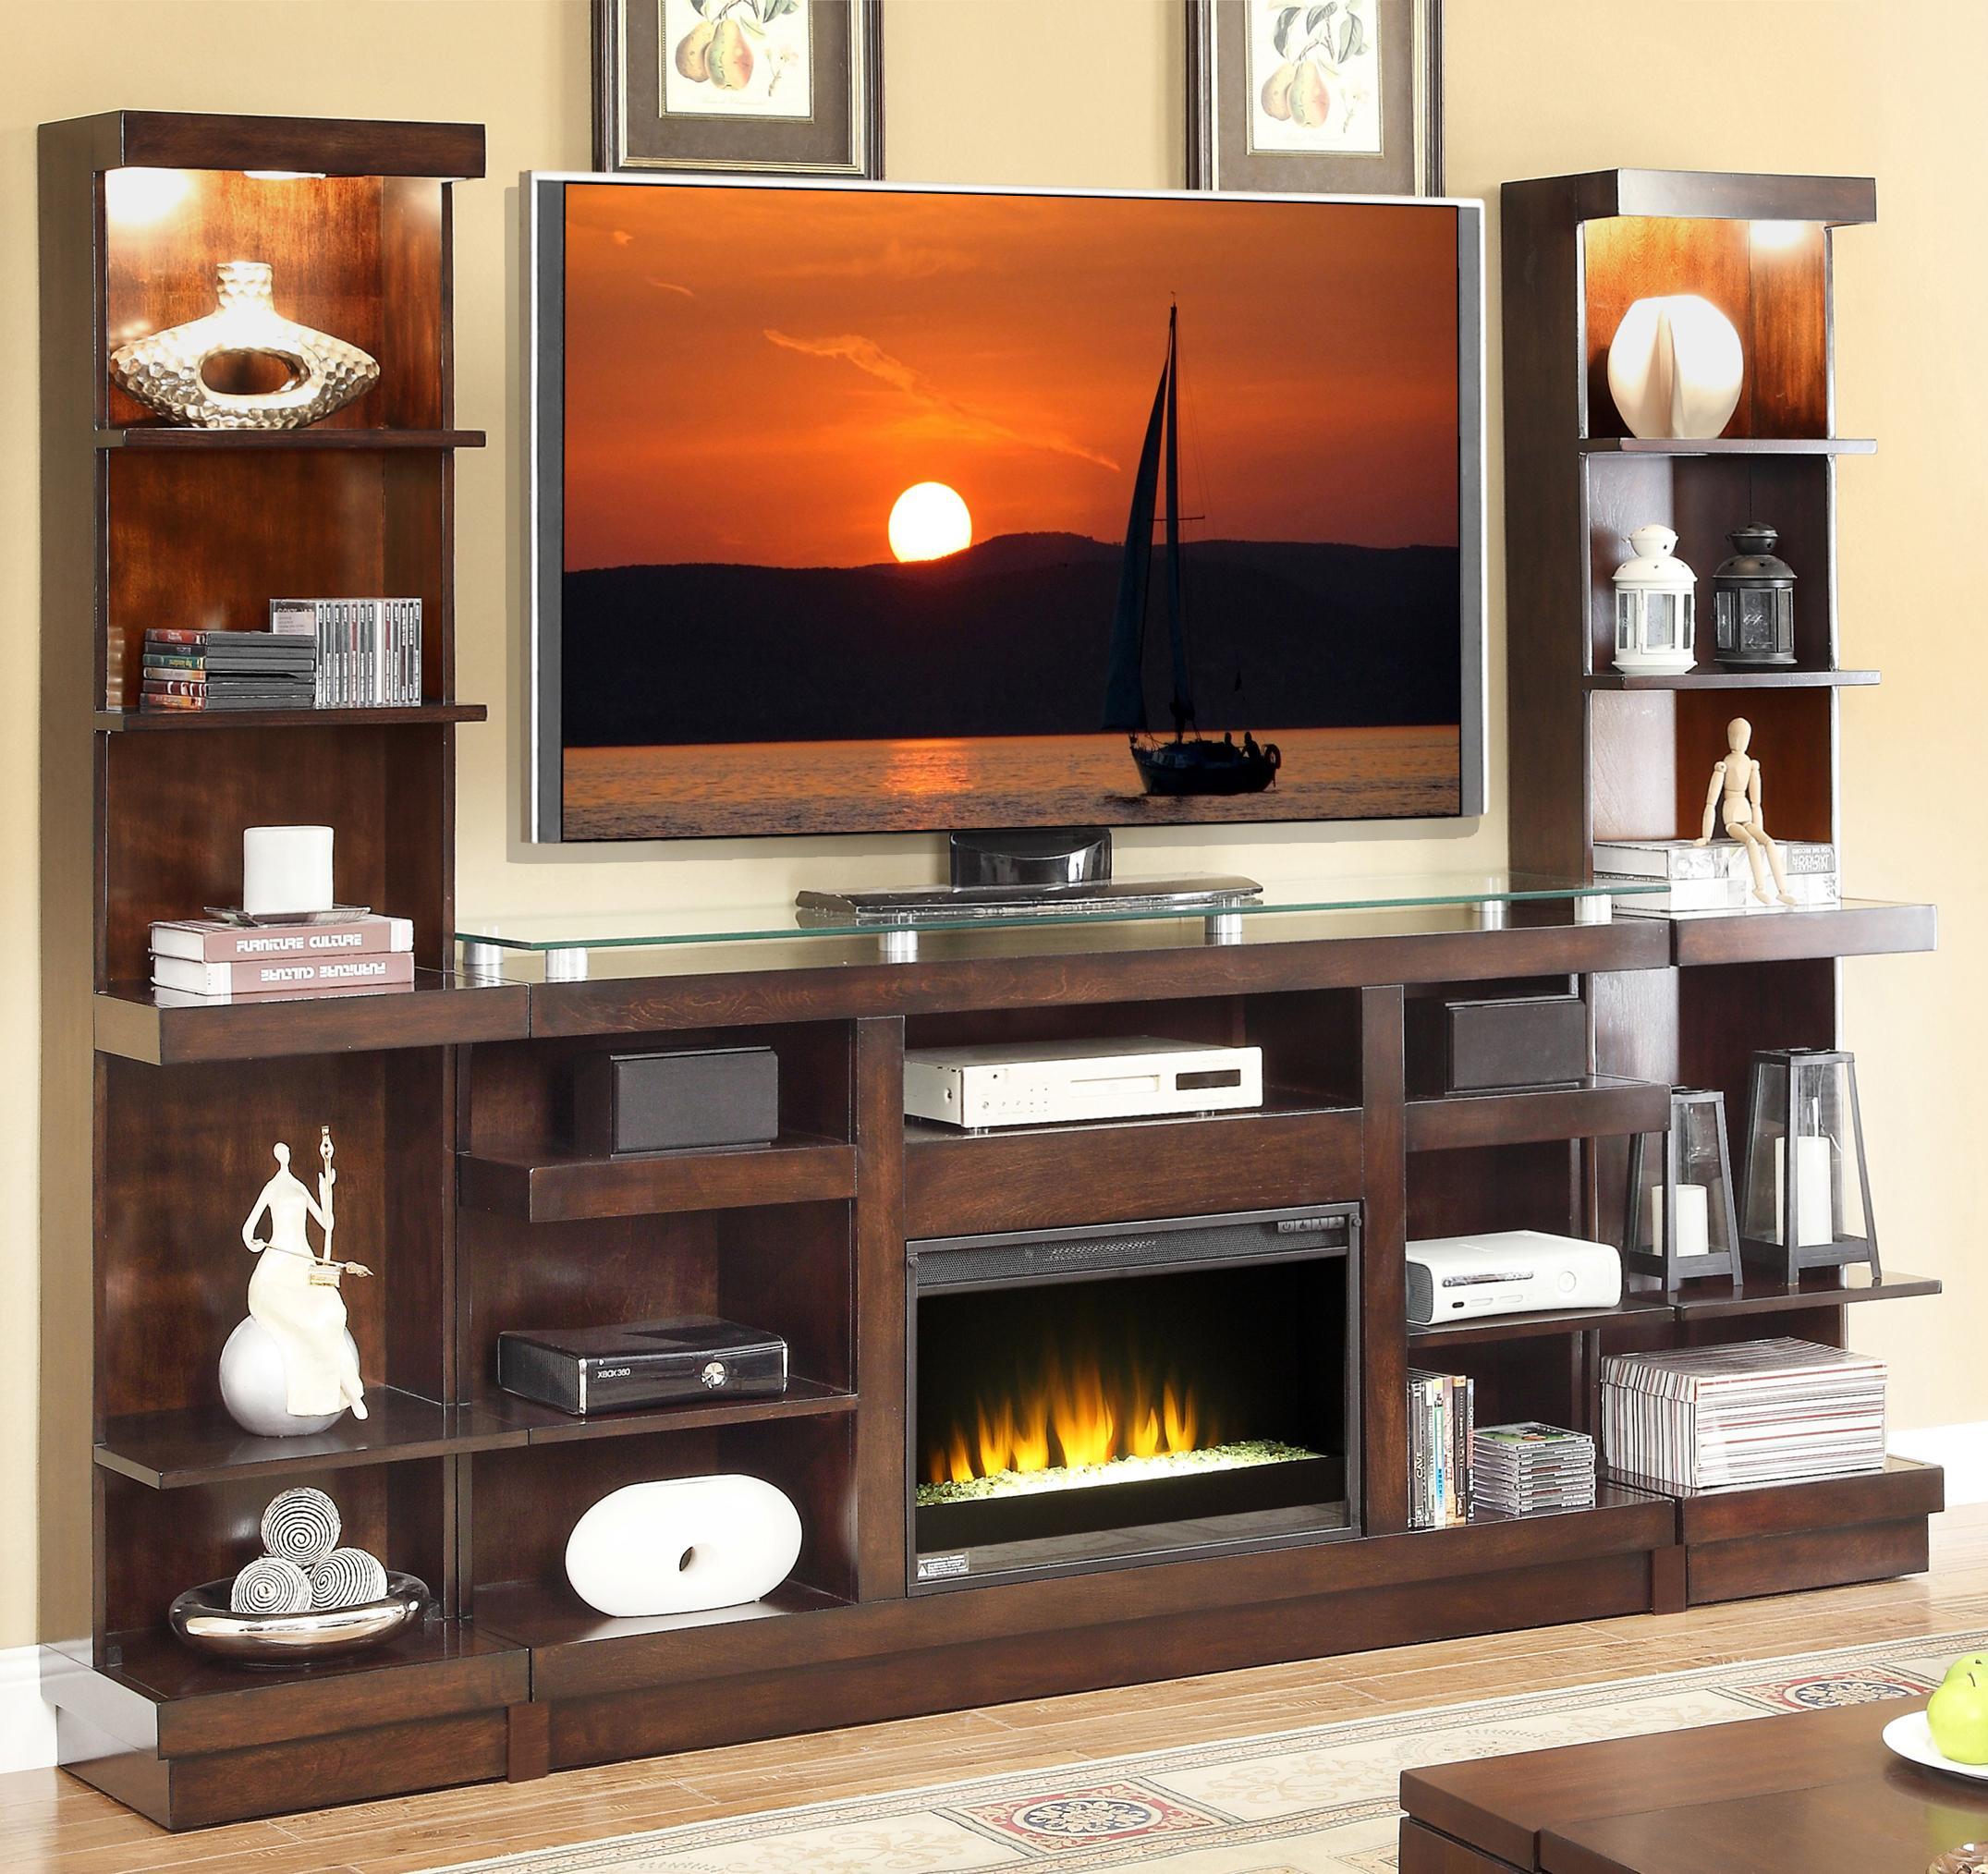 Legends Furniture Novella Entertainment Center with